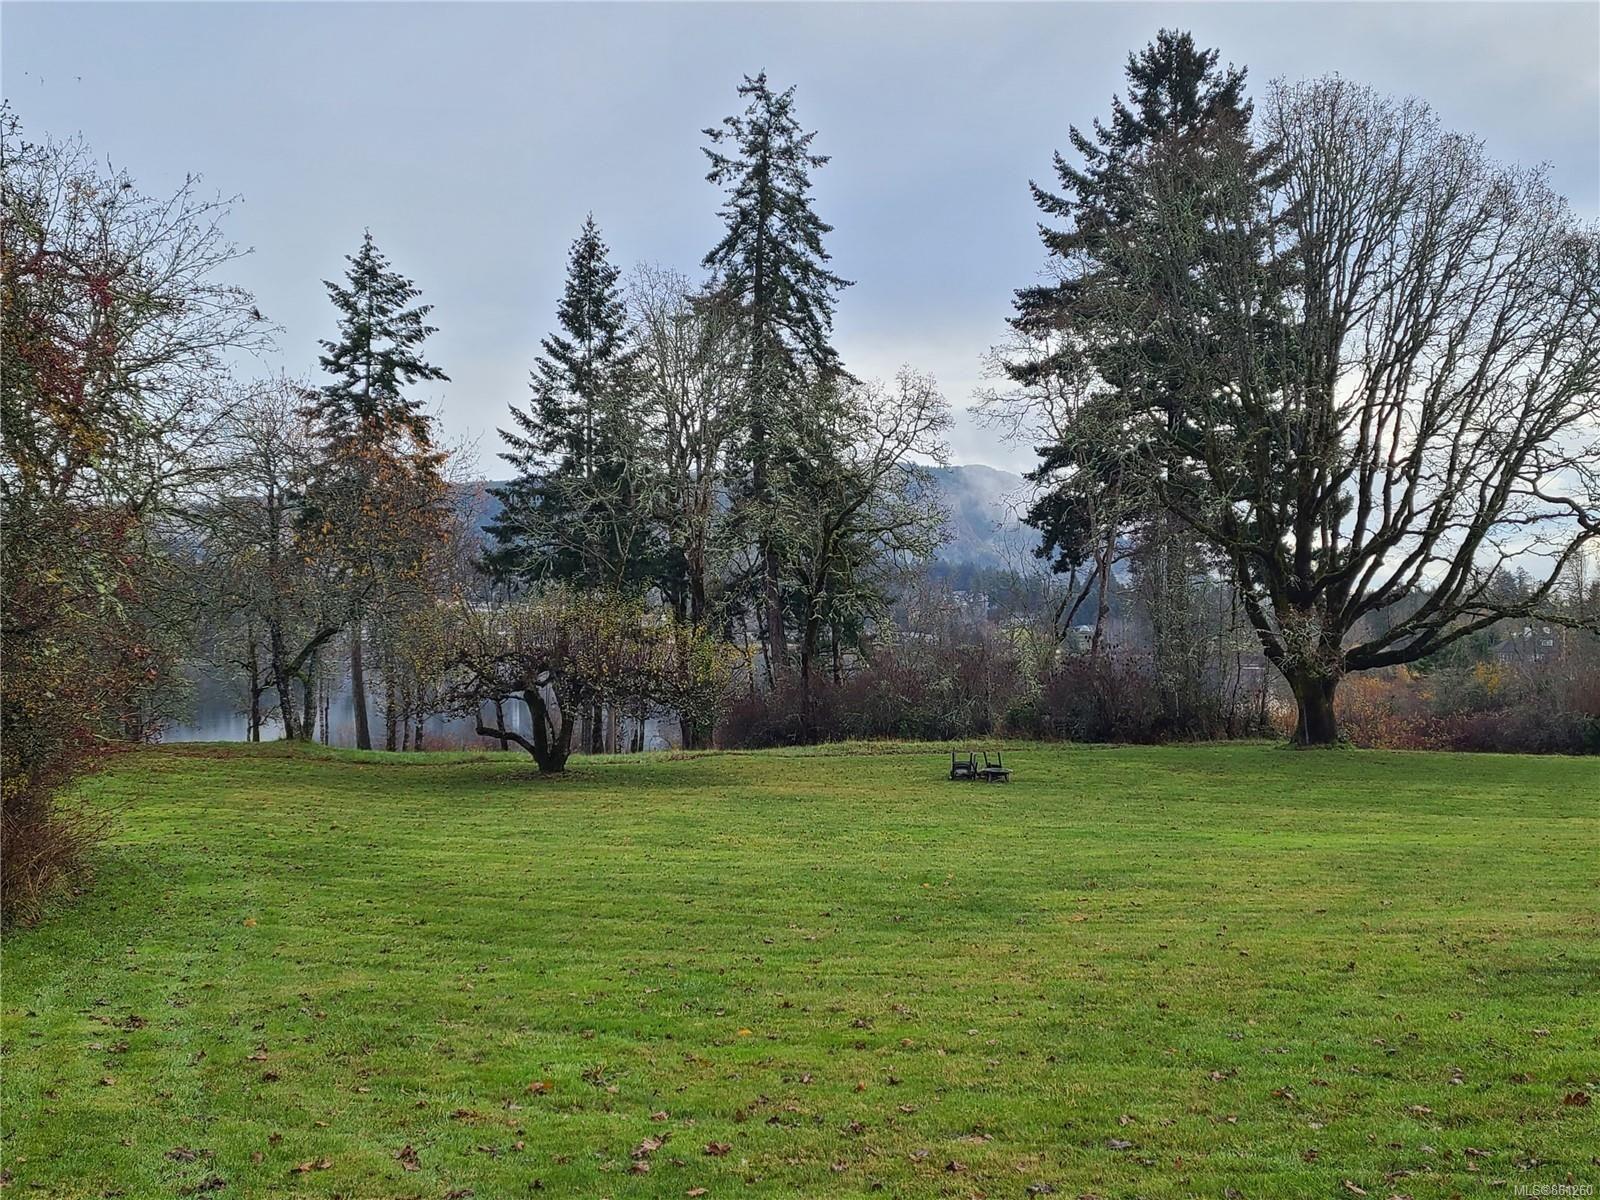 Photo 10: Photos: LT 2 2245 Moose Rd in : Du East Duncan Multi Family for sale (Duncan)  : MLS®# 861260